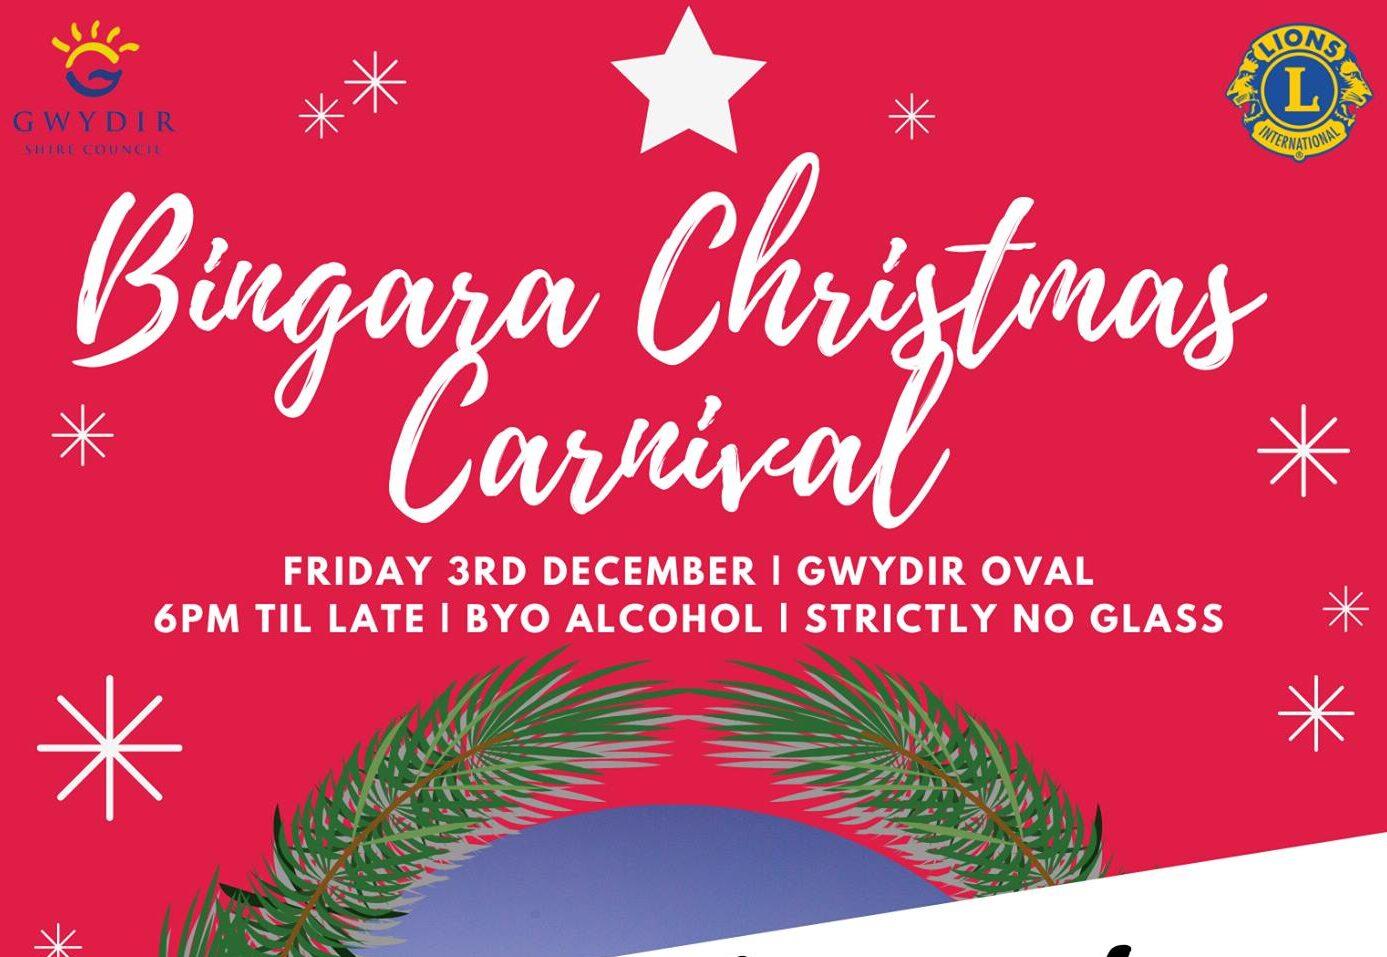 Bingara Christmas Carnival